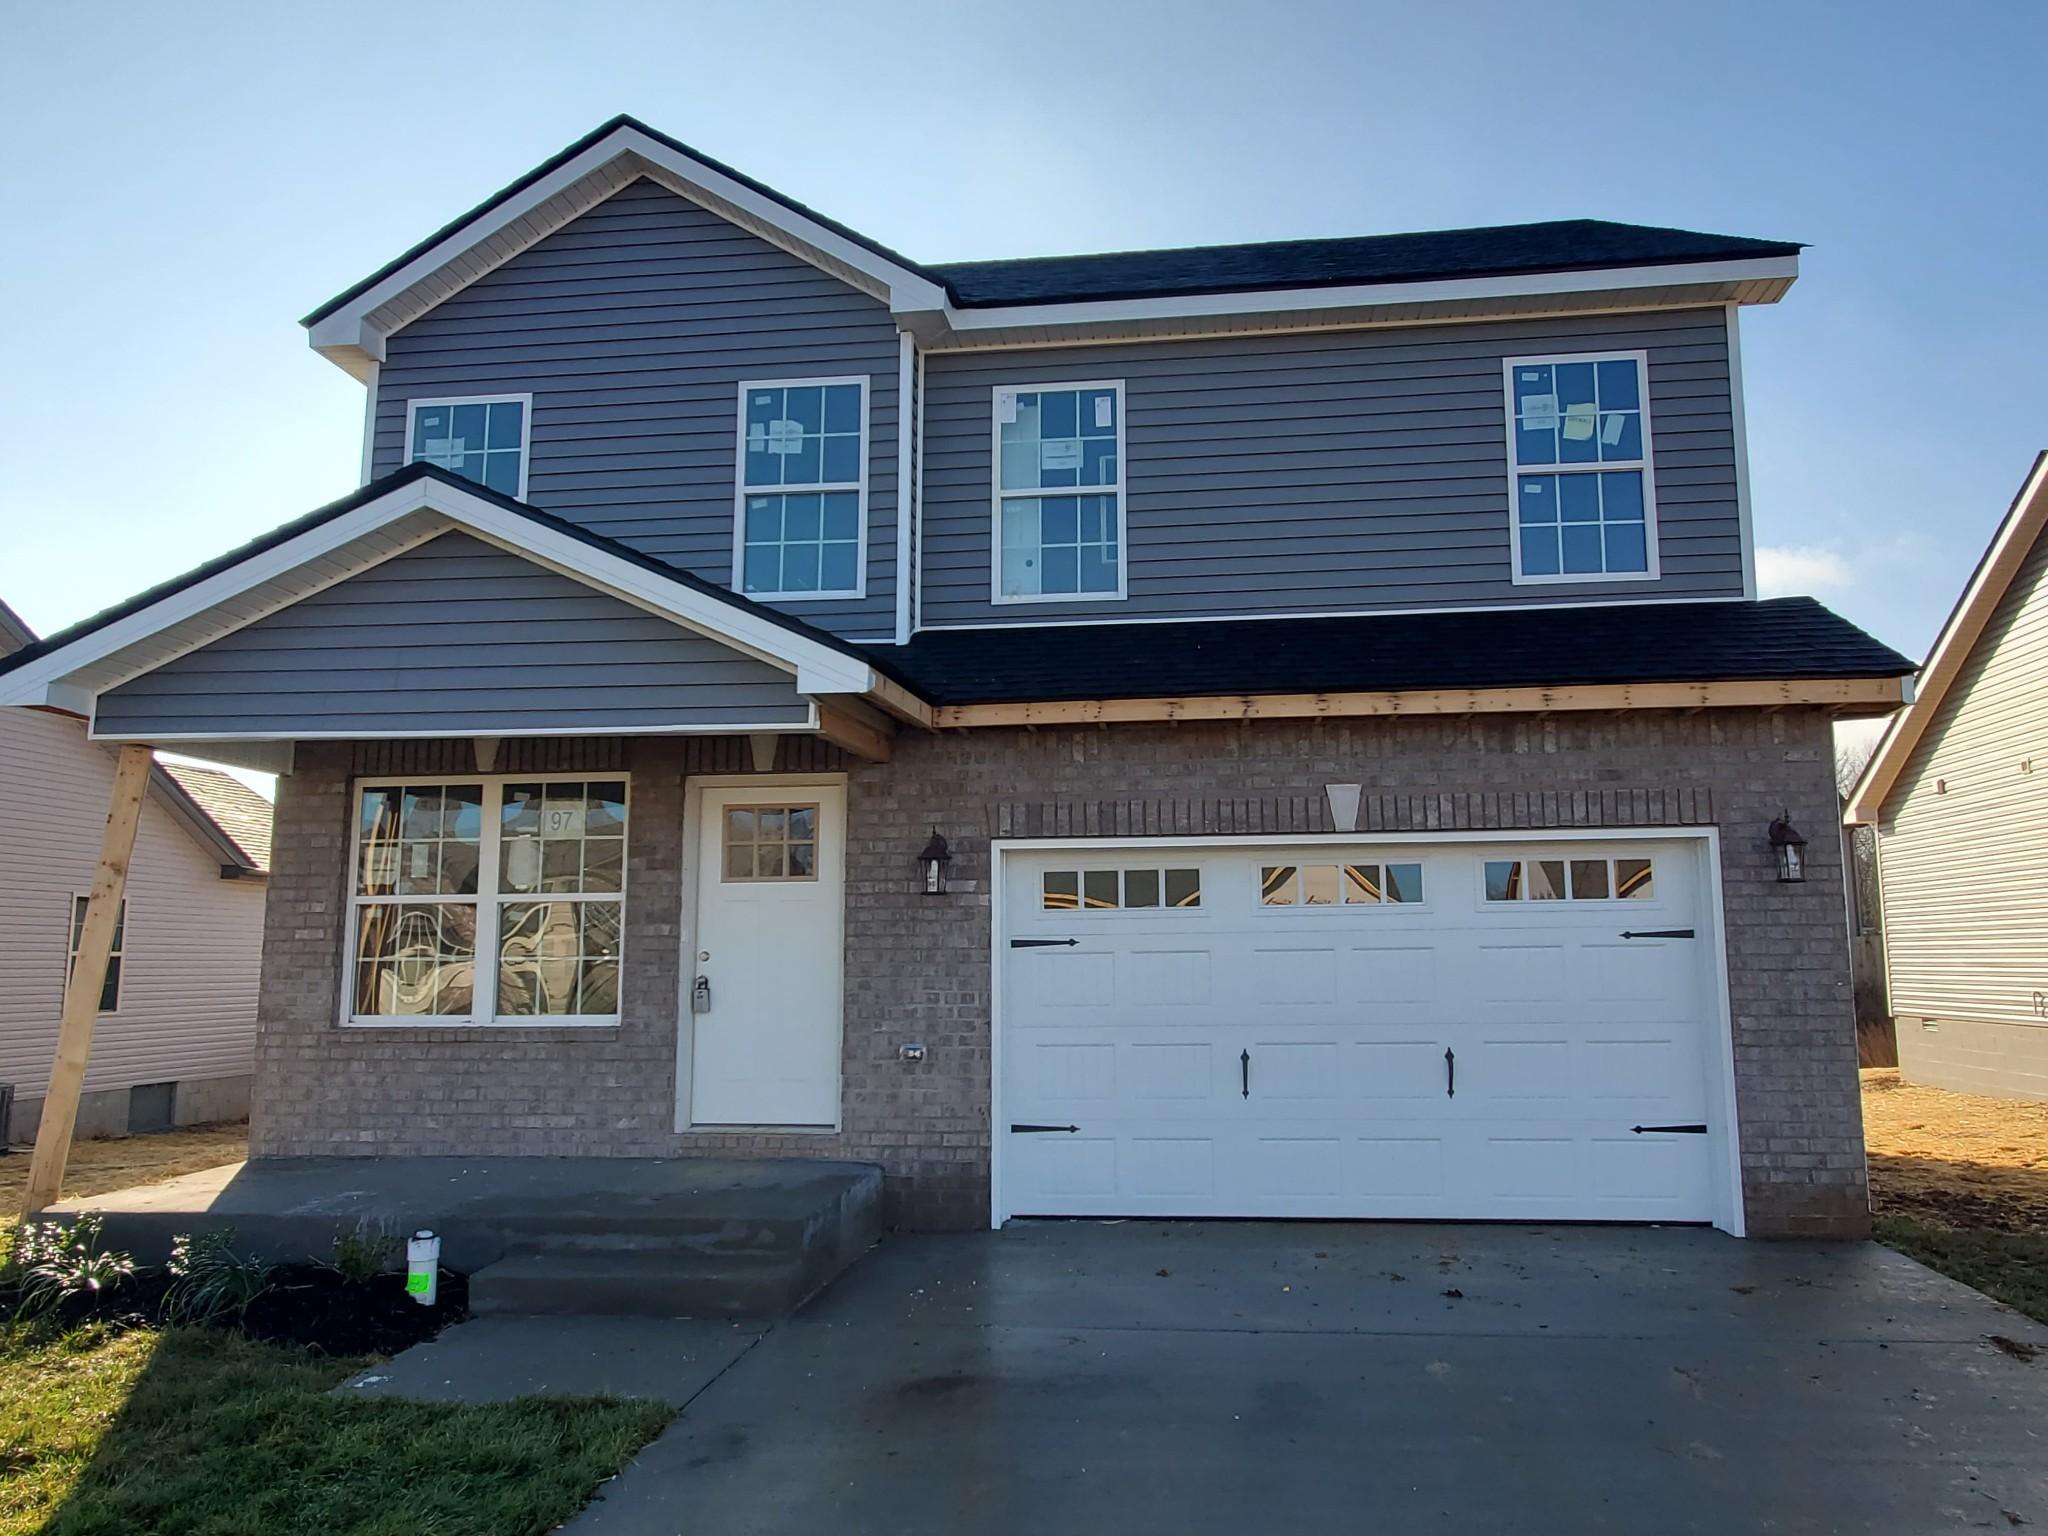 97 Rose Edd Estates, Oak Grove, KY 42262 - Oak Grove, KY real estate listing